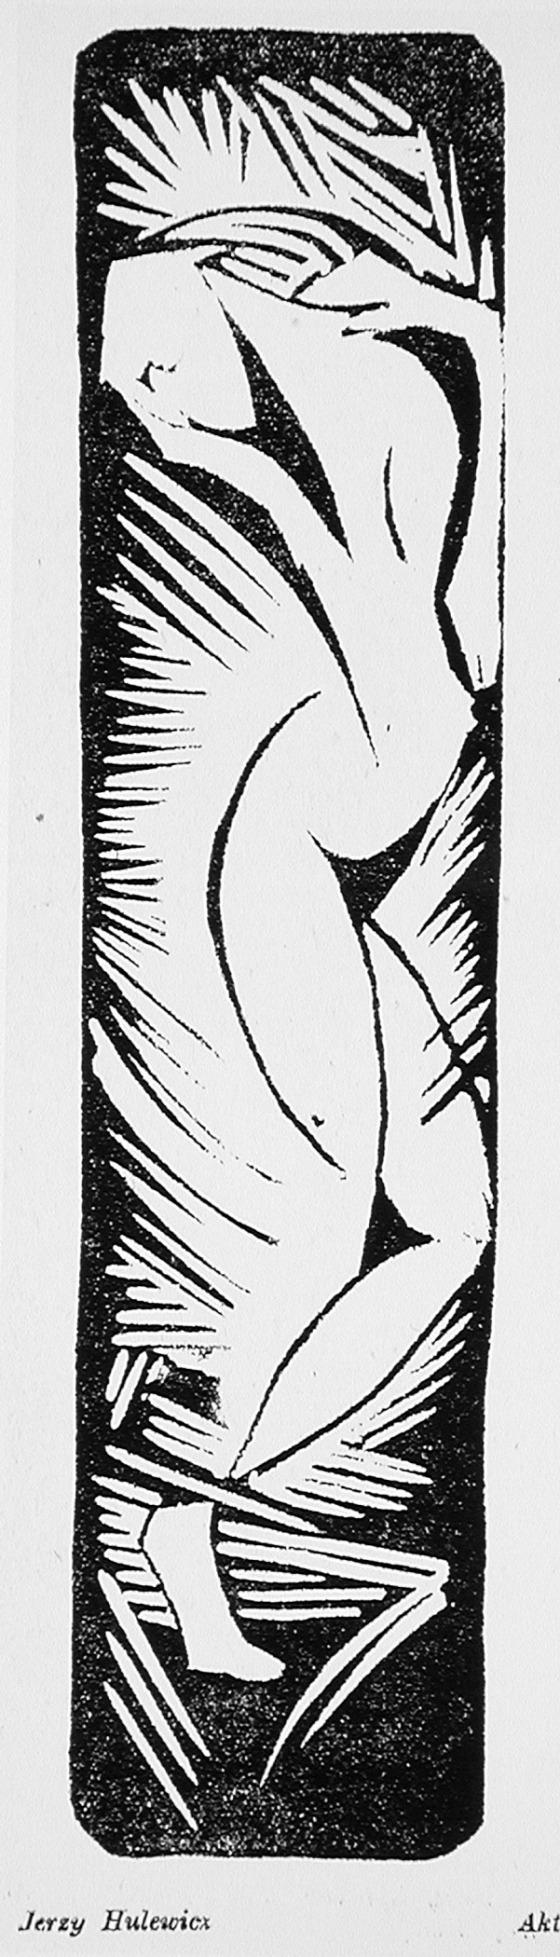 Jerzy Hulewicz (Poland 1886 - 1940), Nude, 1918, woodcut. Image size 7 3/4 x 1…